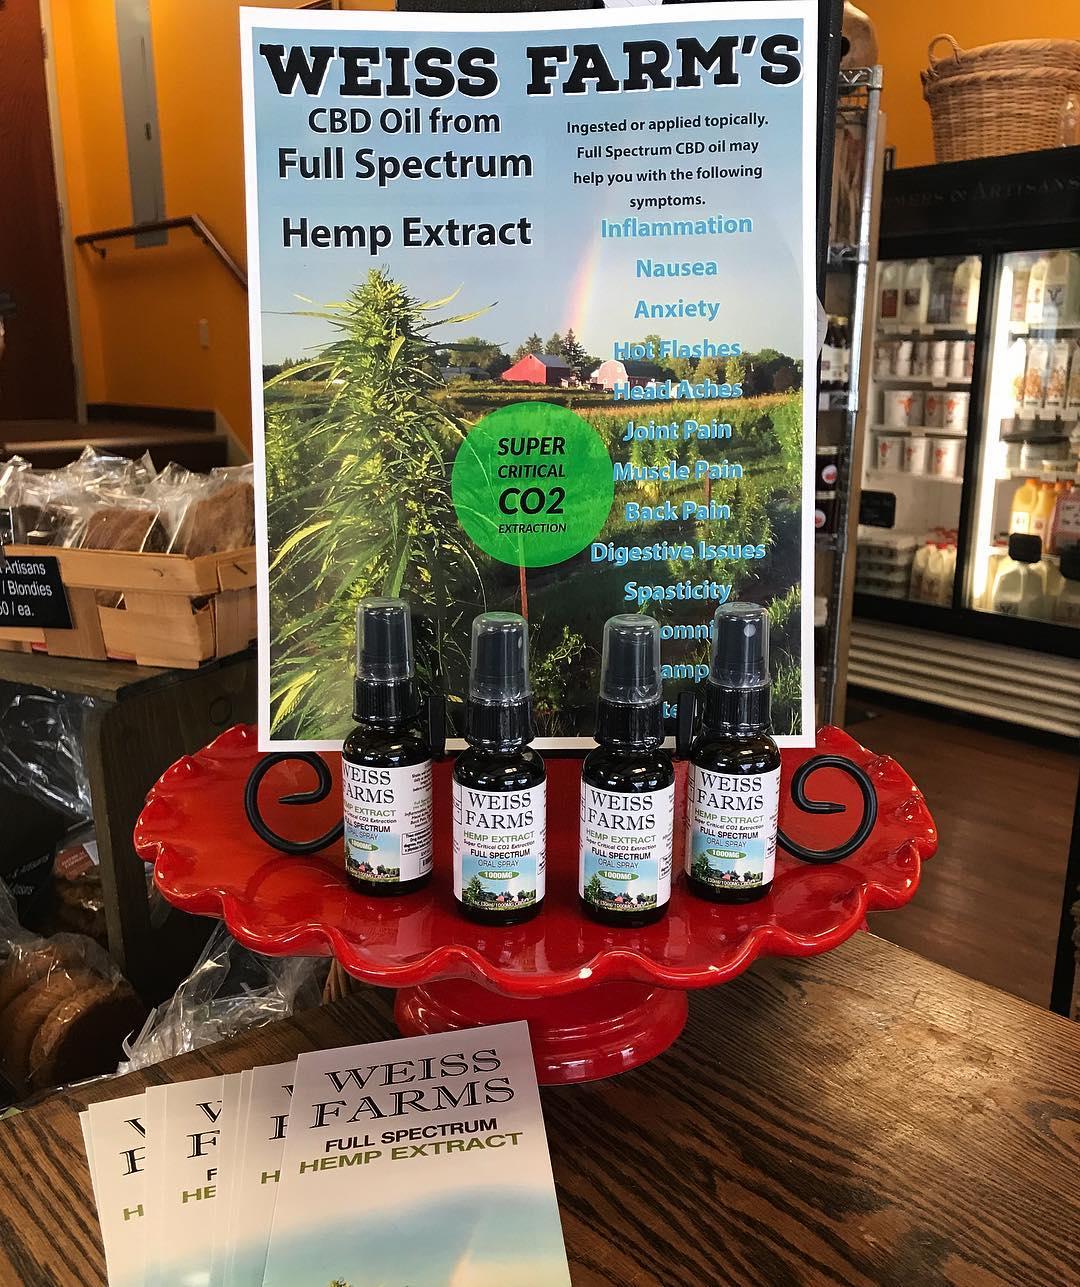 Hemp Extract Cbd Oil Info Night With Industrial Hemp Grower Tony Weiss From Weiss Farm In Eden Ny Farmers Artisans